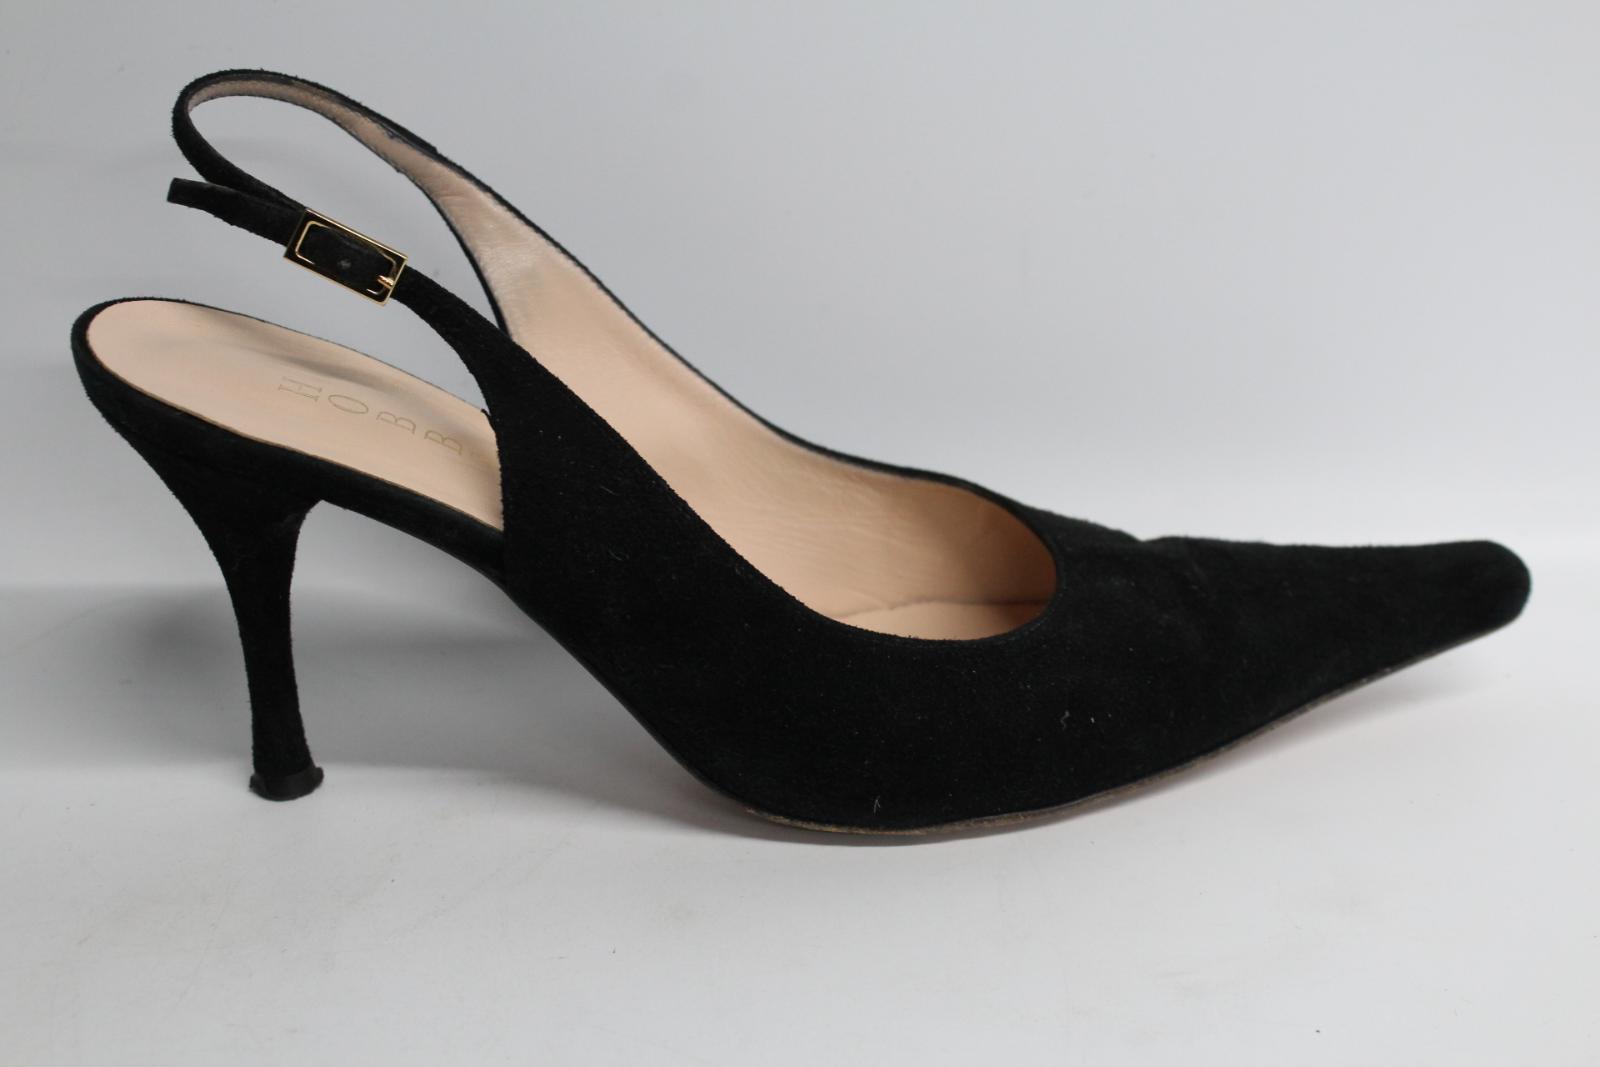 Hobbs-femmes-en-daim-noir-Sling-Arriere-bout-pointu-et-talon-aiguille-Chaussure-UK6-5-EU39-5 miniature 9